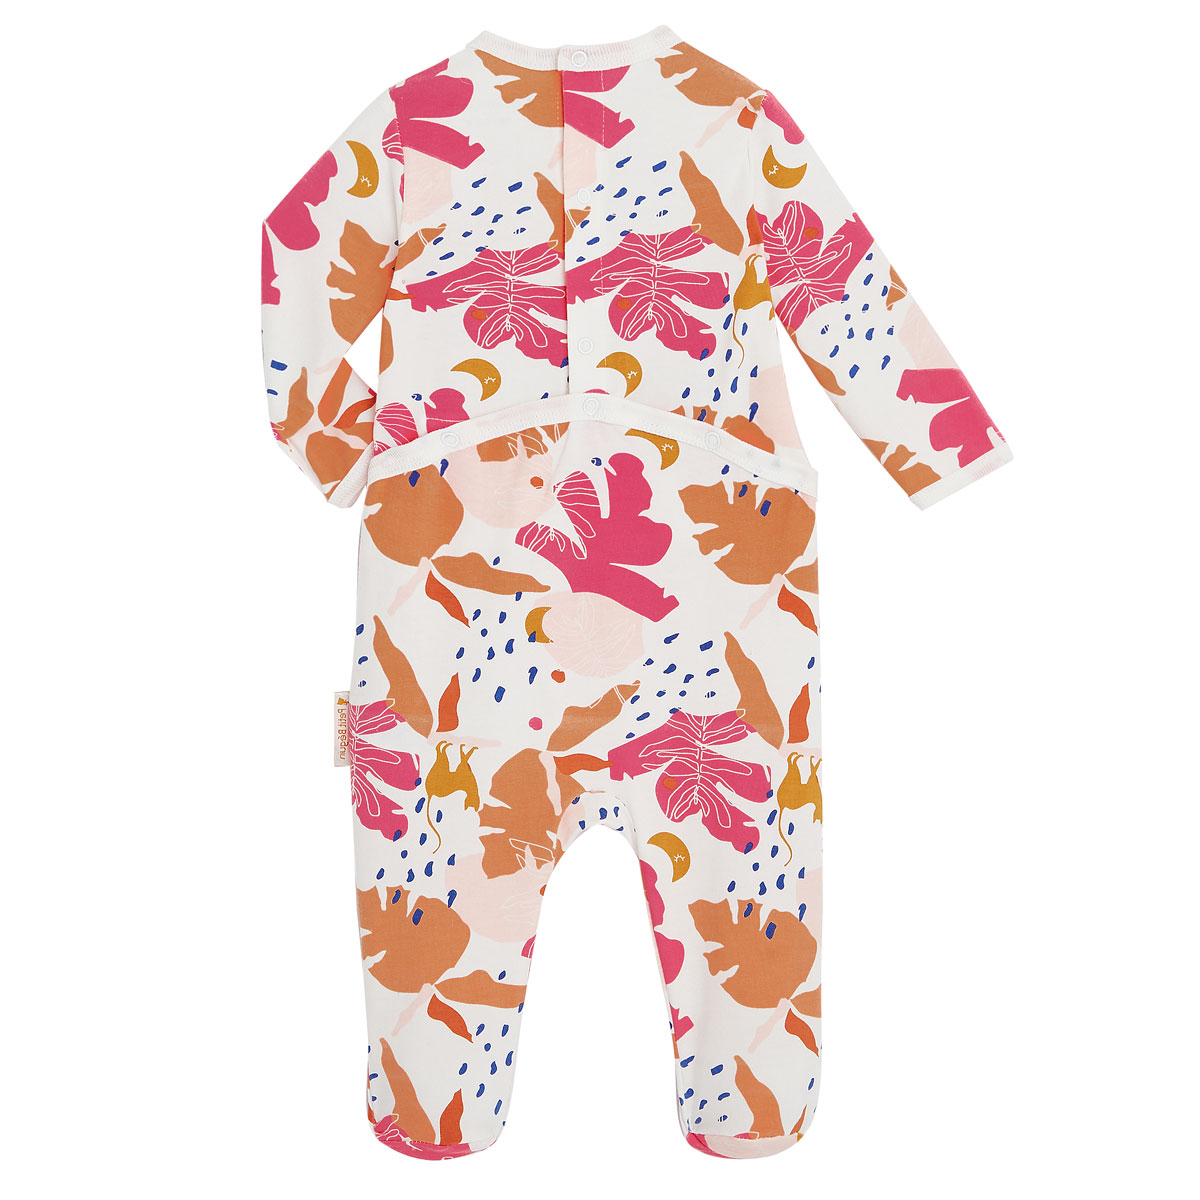 Pyjama bébé contenant du coton bio Perle de Lune dos